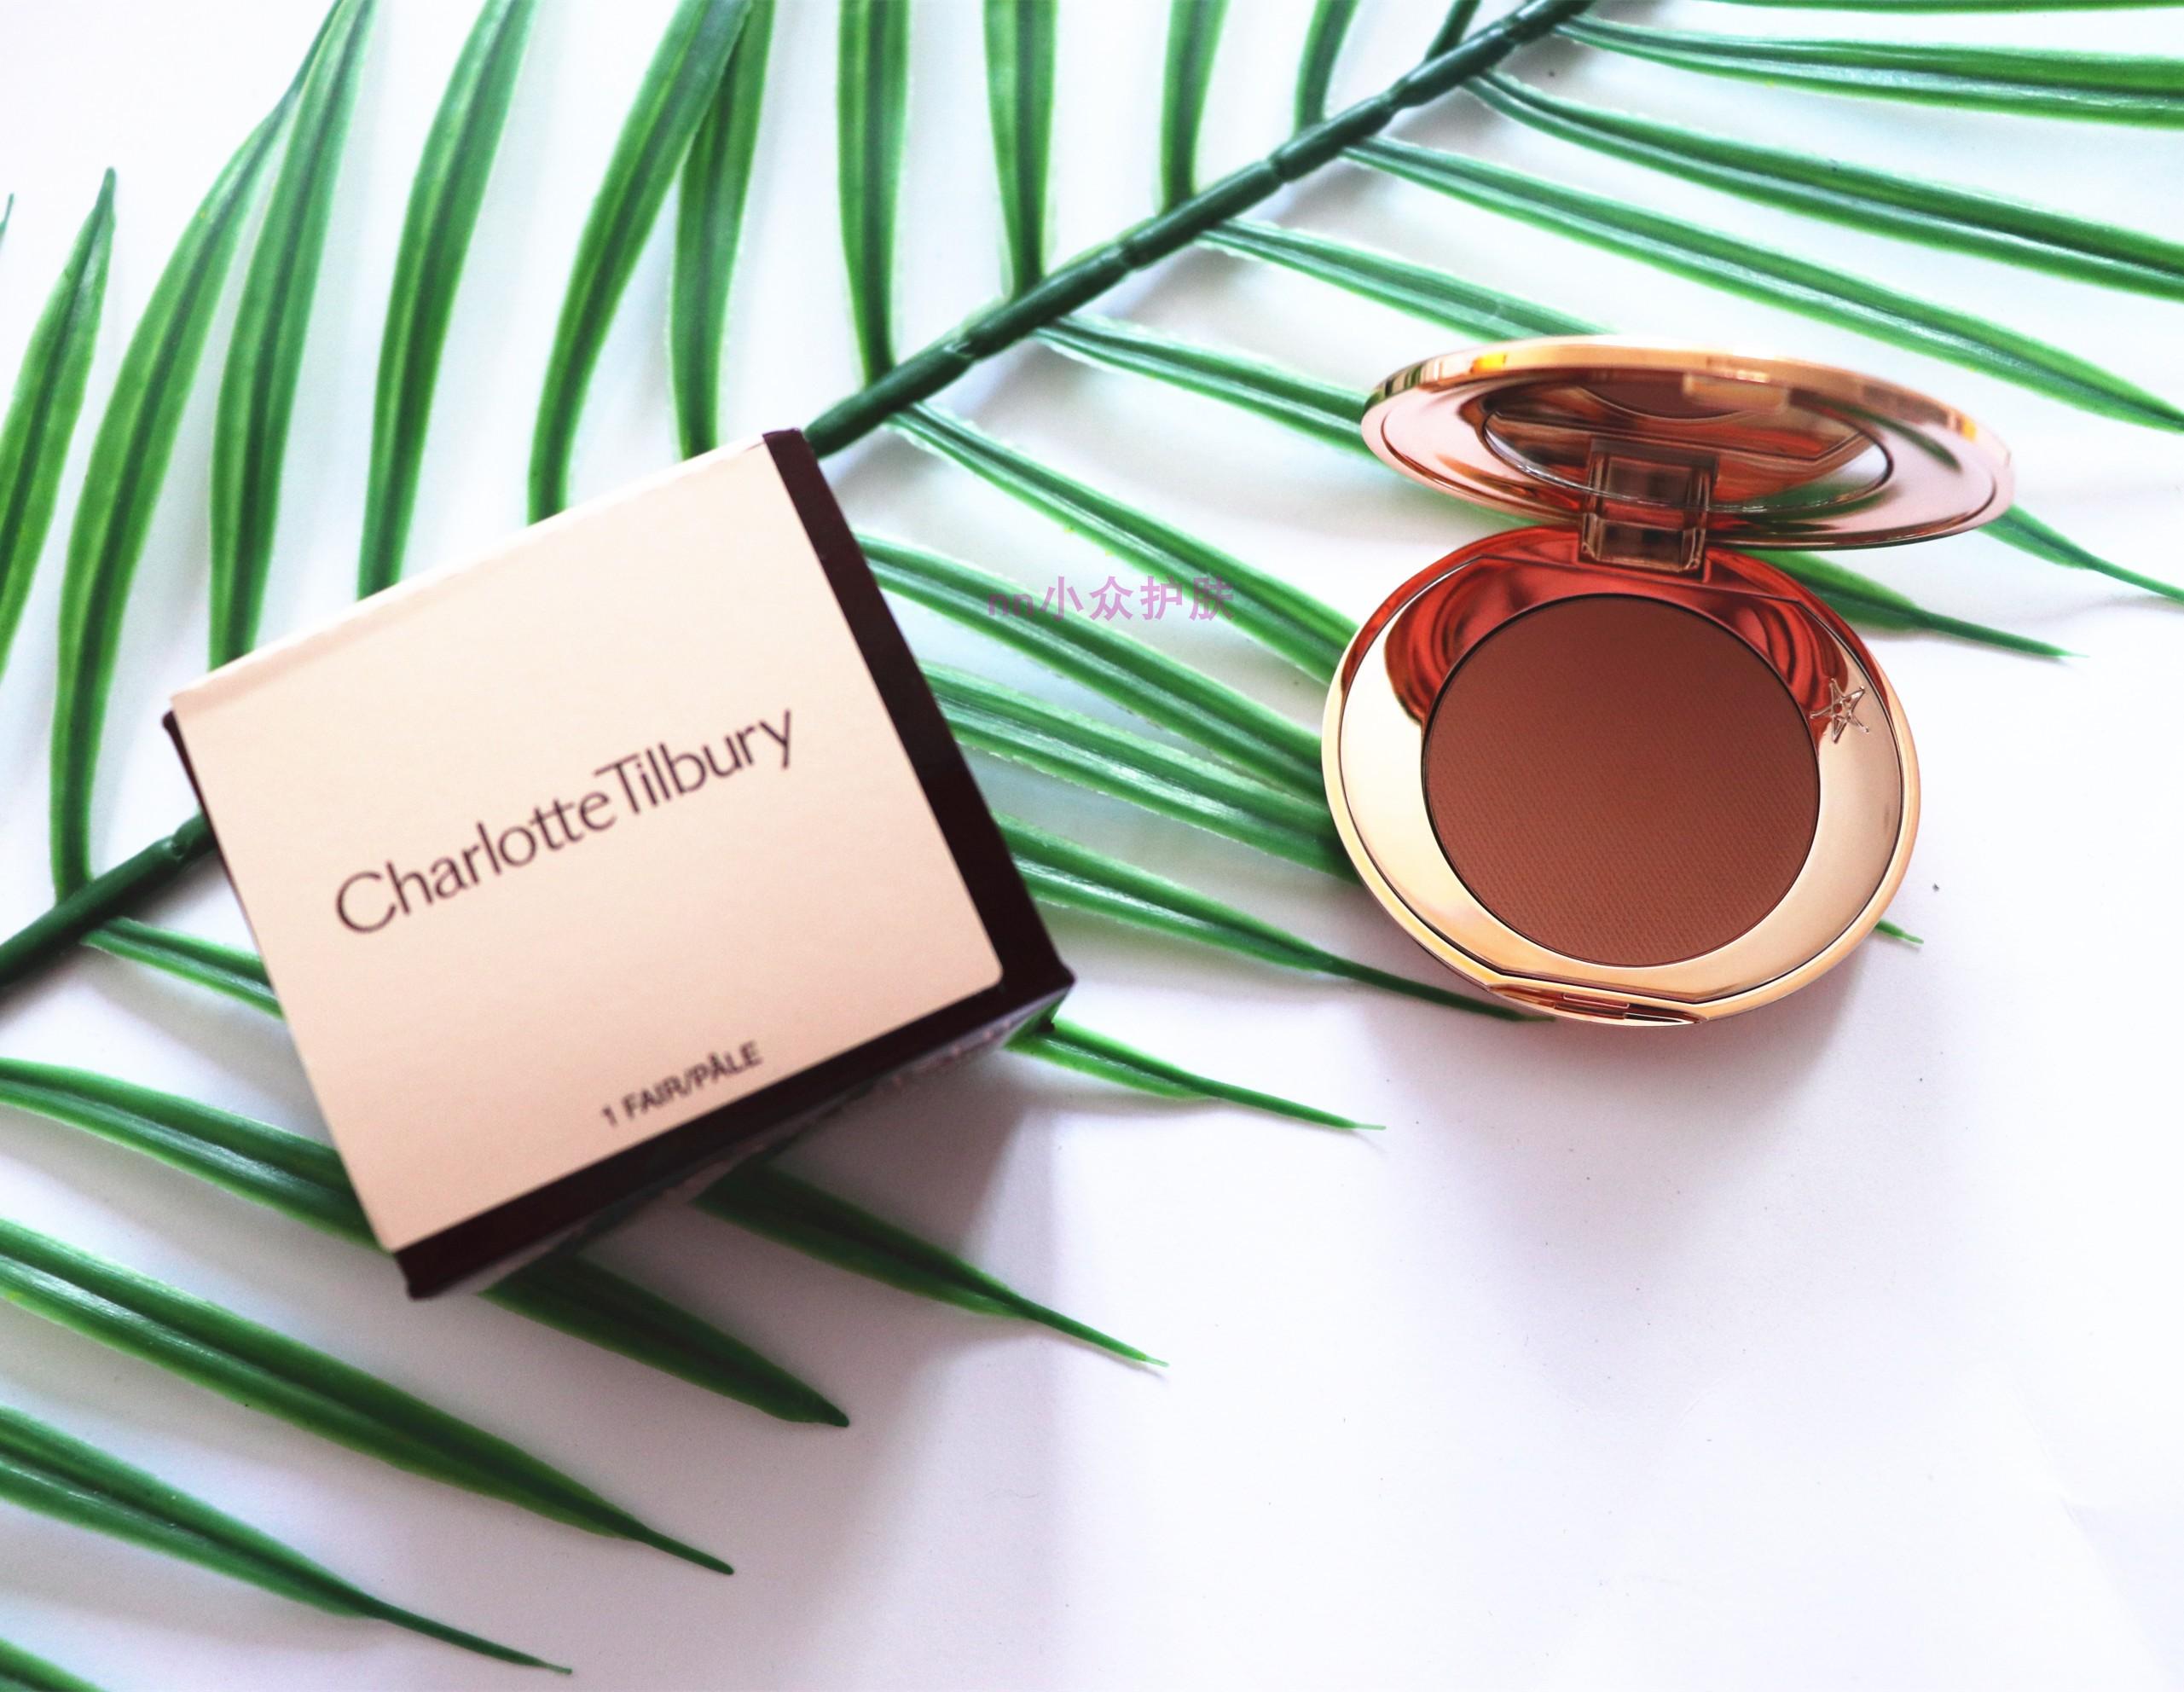 CT Charlotte Tilbury Magic Vanish eye color correction cream, color blemish 19 new